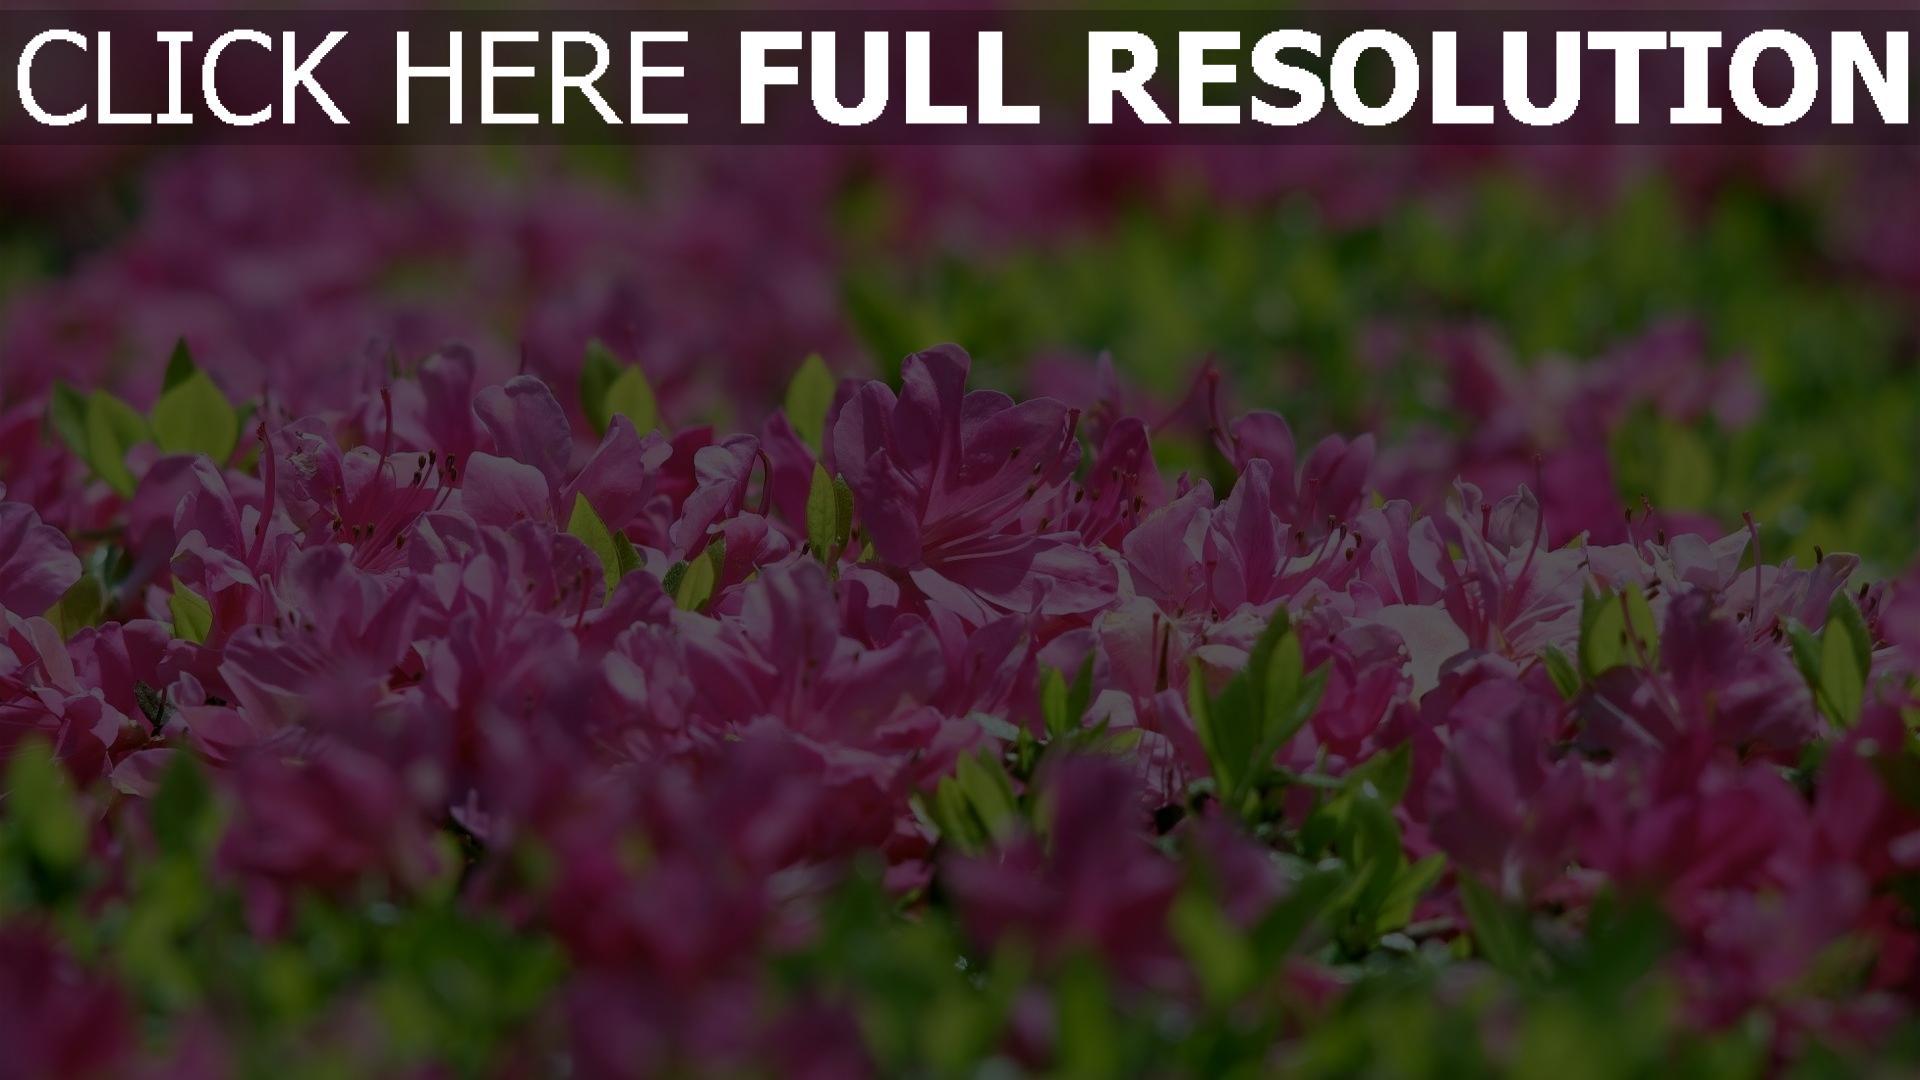 hd hintergrundbilder rhododendron blüte frühling blätter blüten 1920x1080